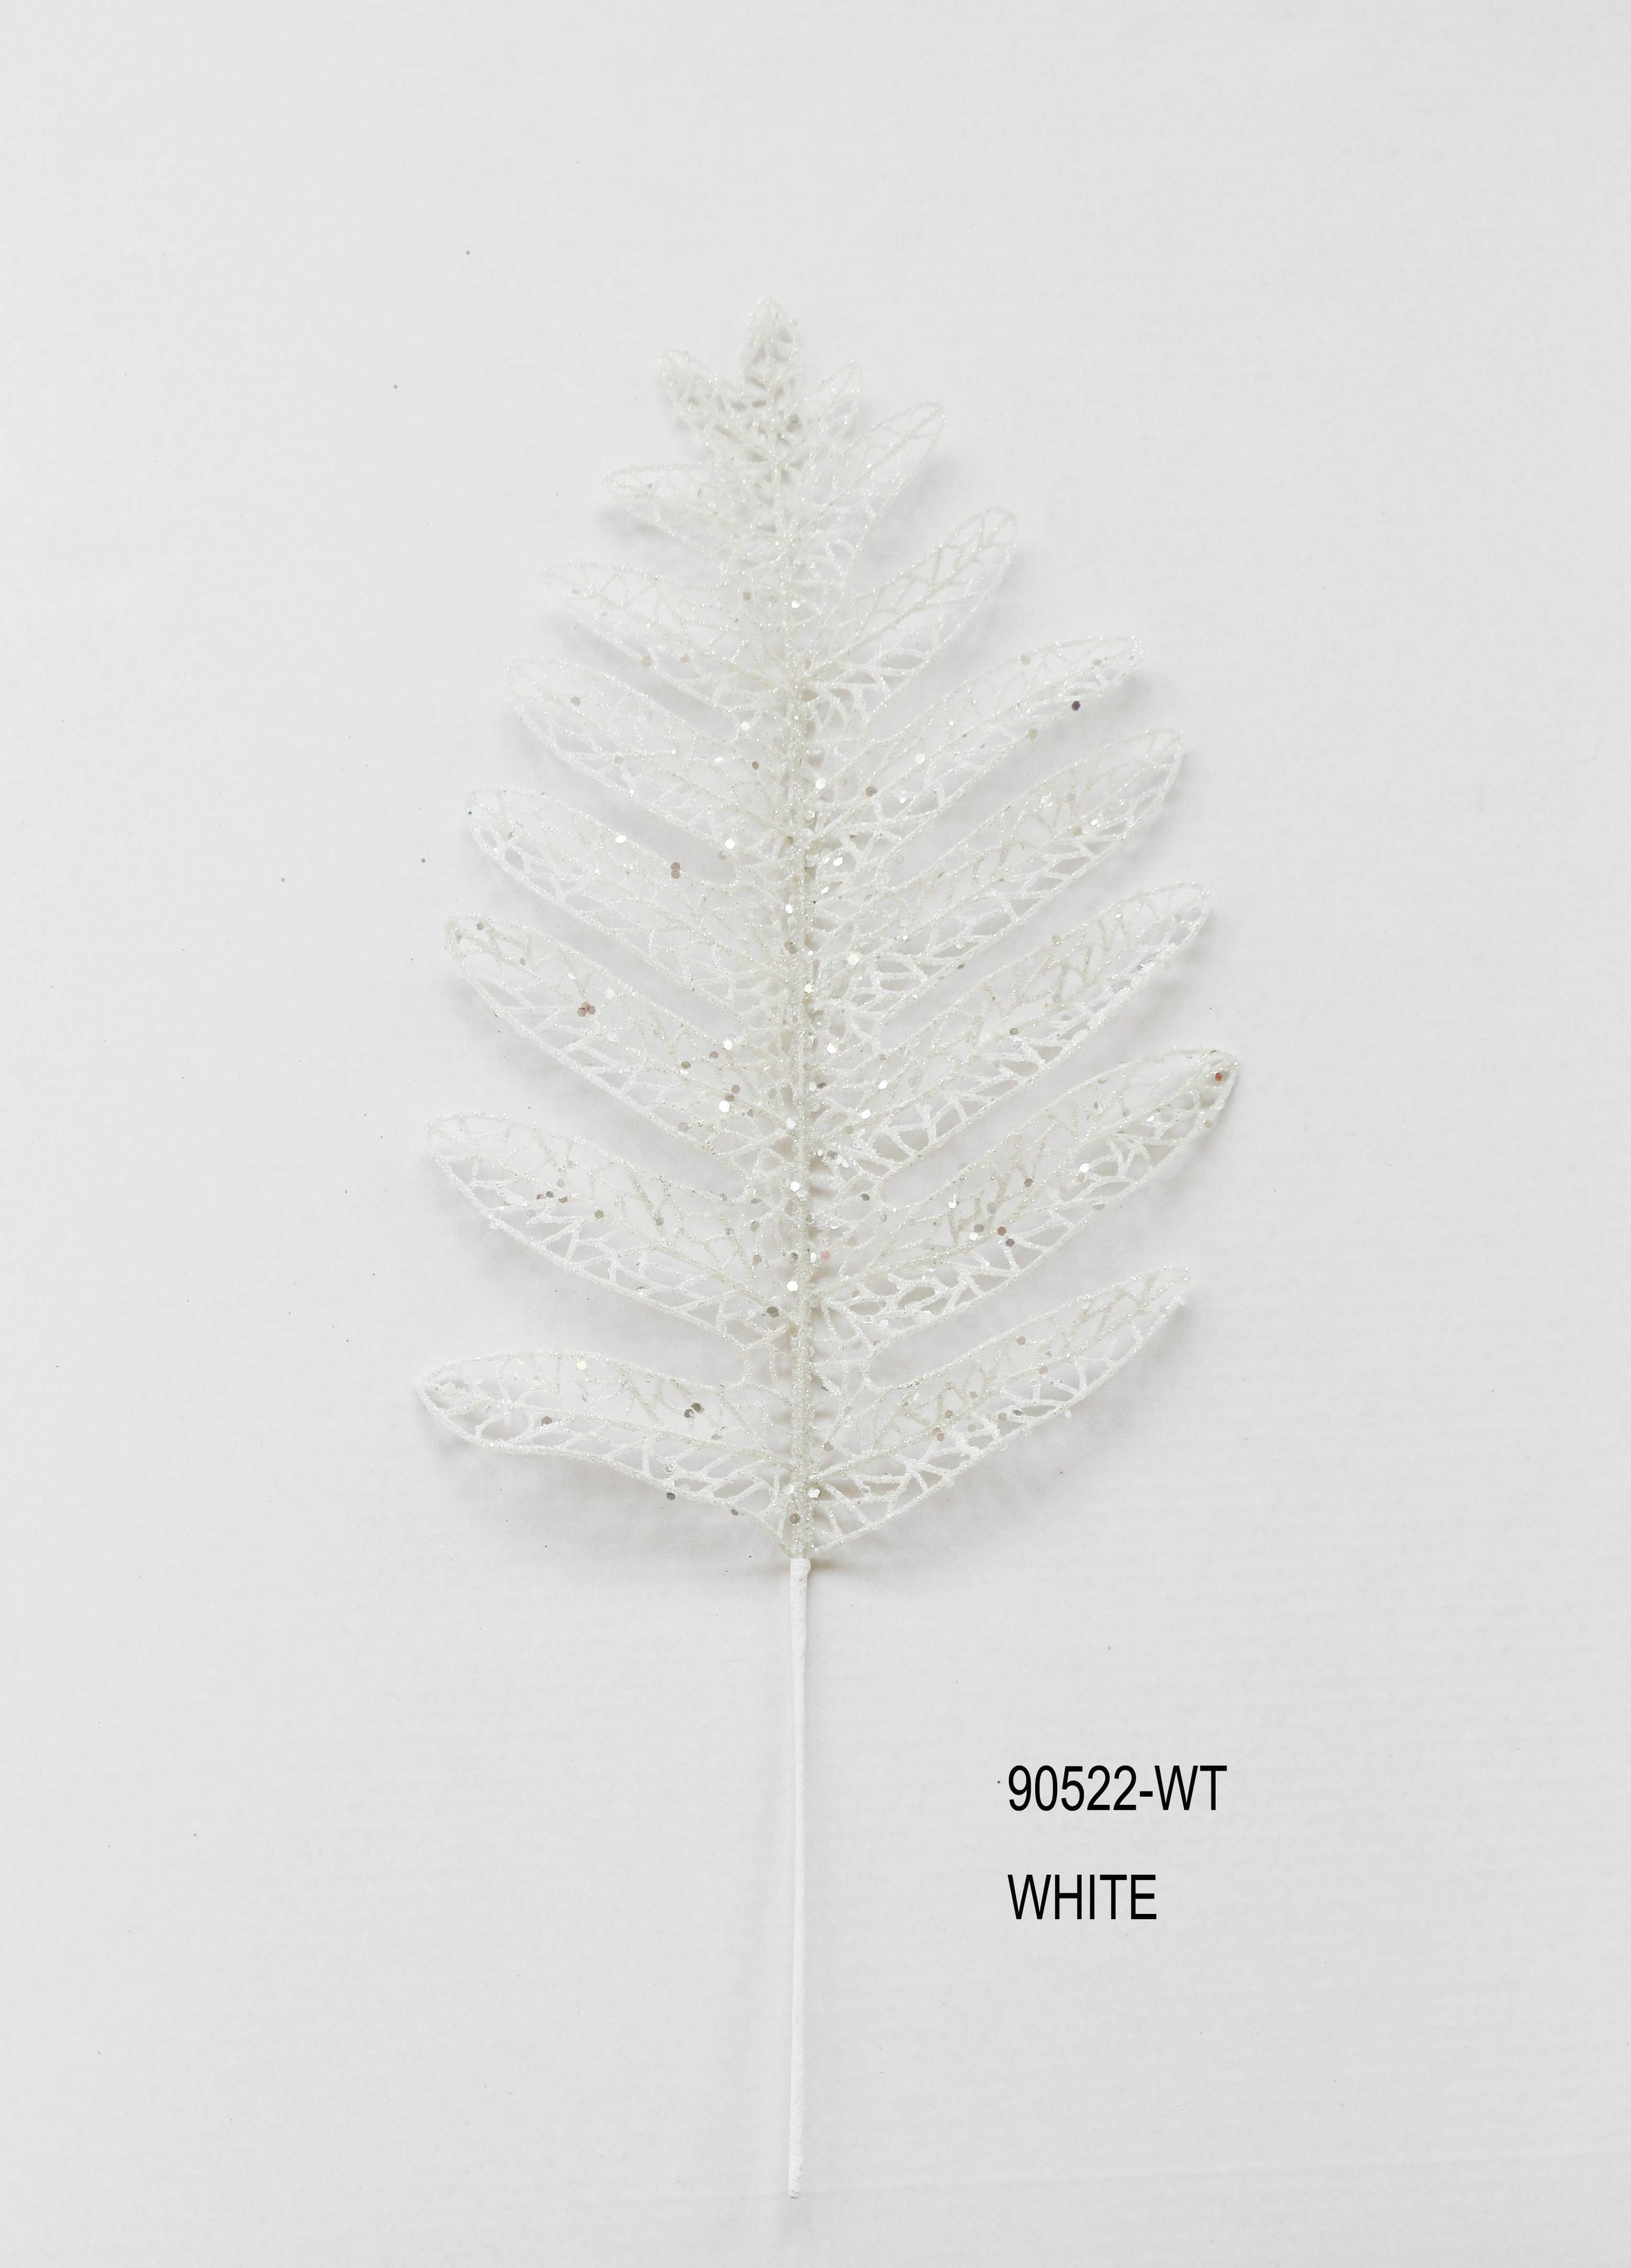 90522-WT